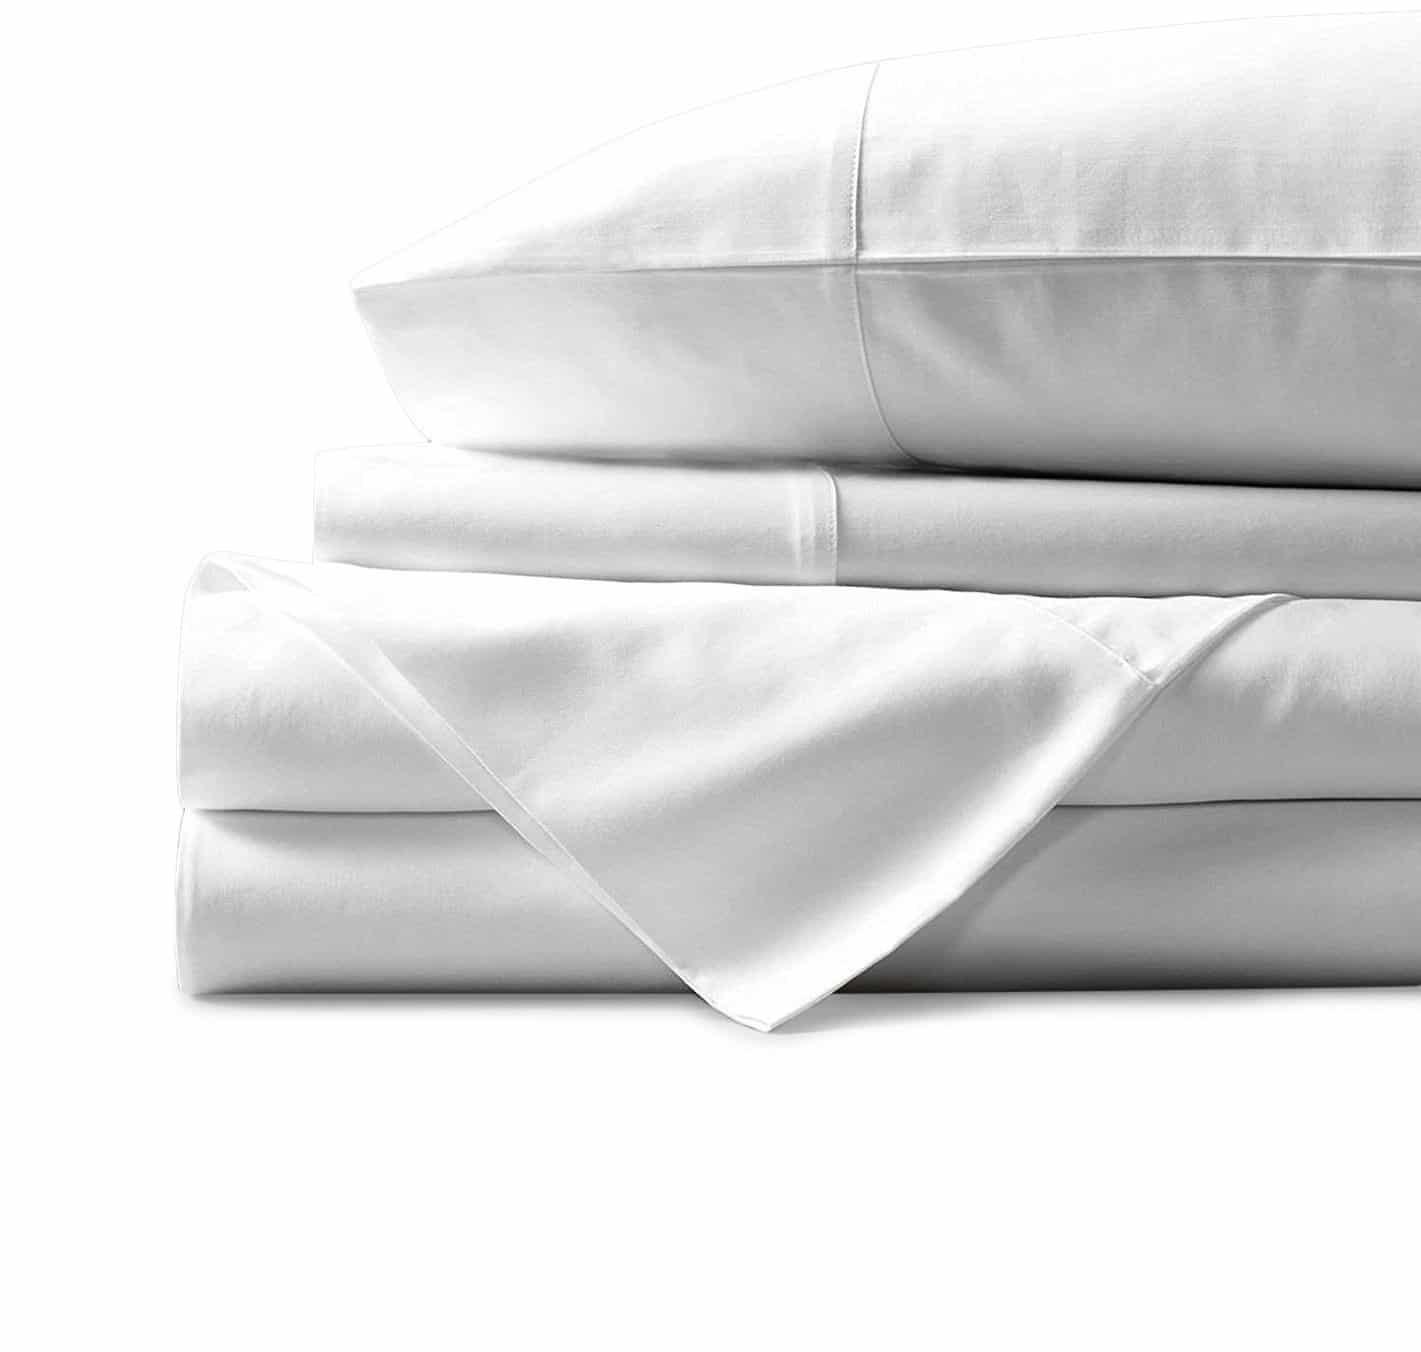 NIYS Luxury Bedding 100/% Egyptian Cotton Flat Bedsheets Percale Quality Beige, Double